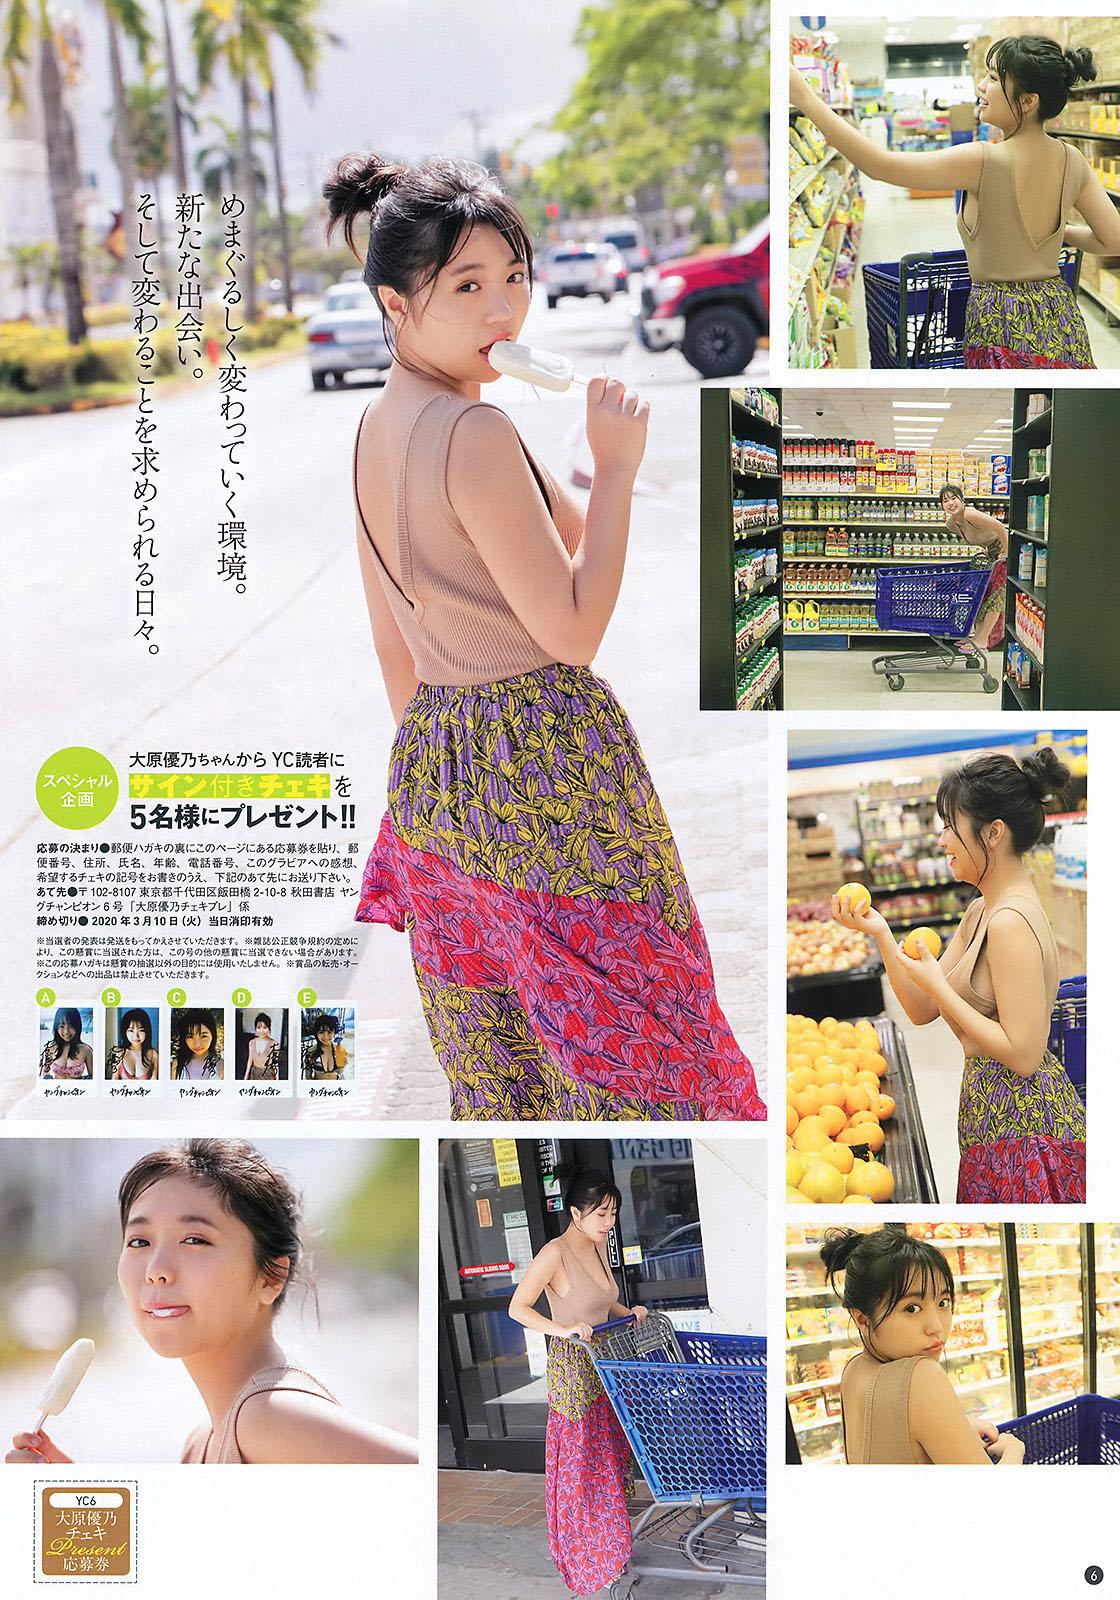 Yuno Ohara Young Champion 200310 04.jpg